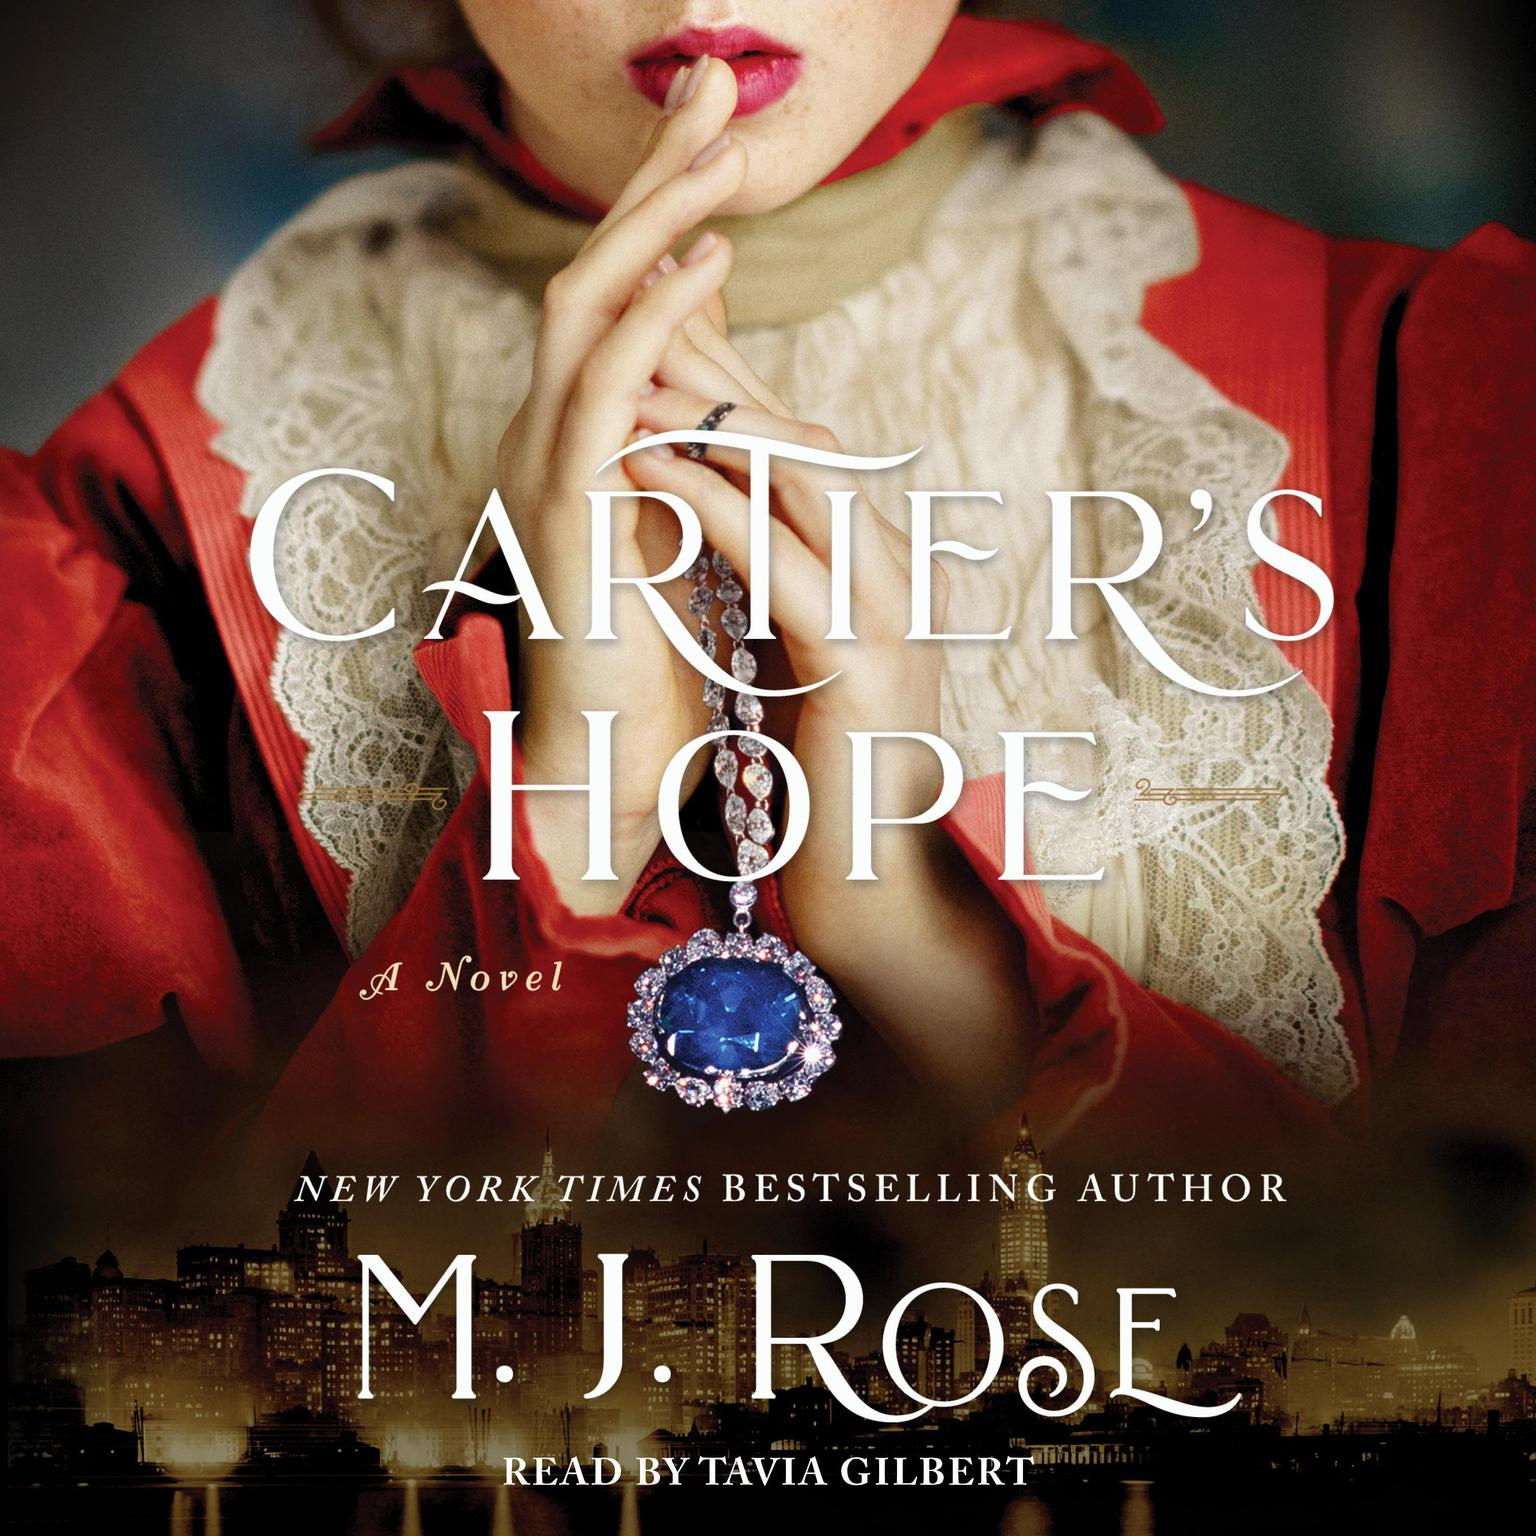 Printable Cartier's Hope: A Novel Audiobook Cover Art